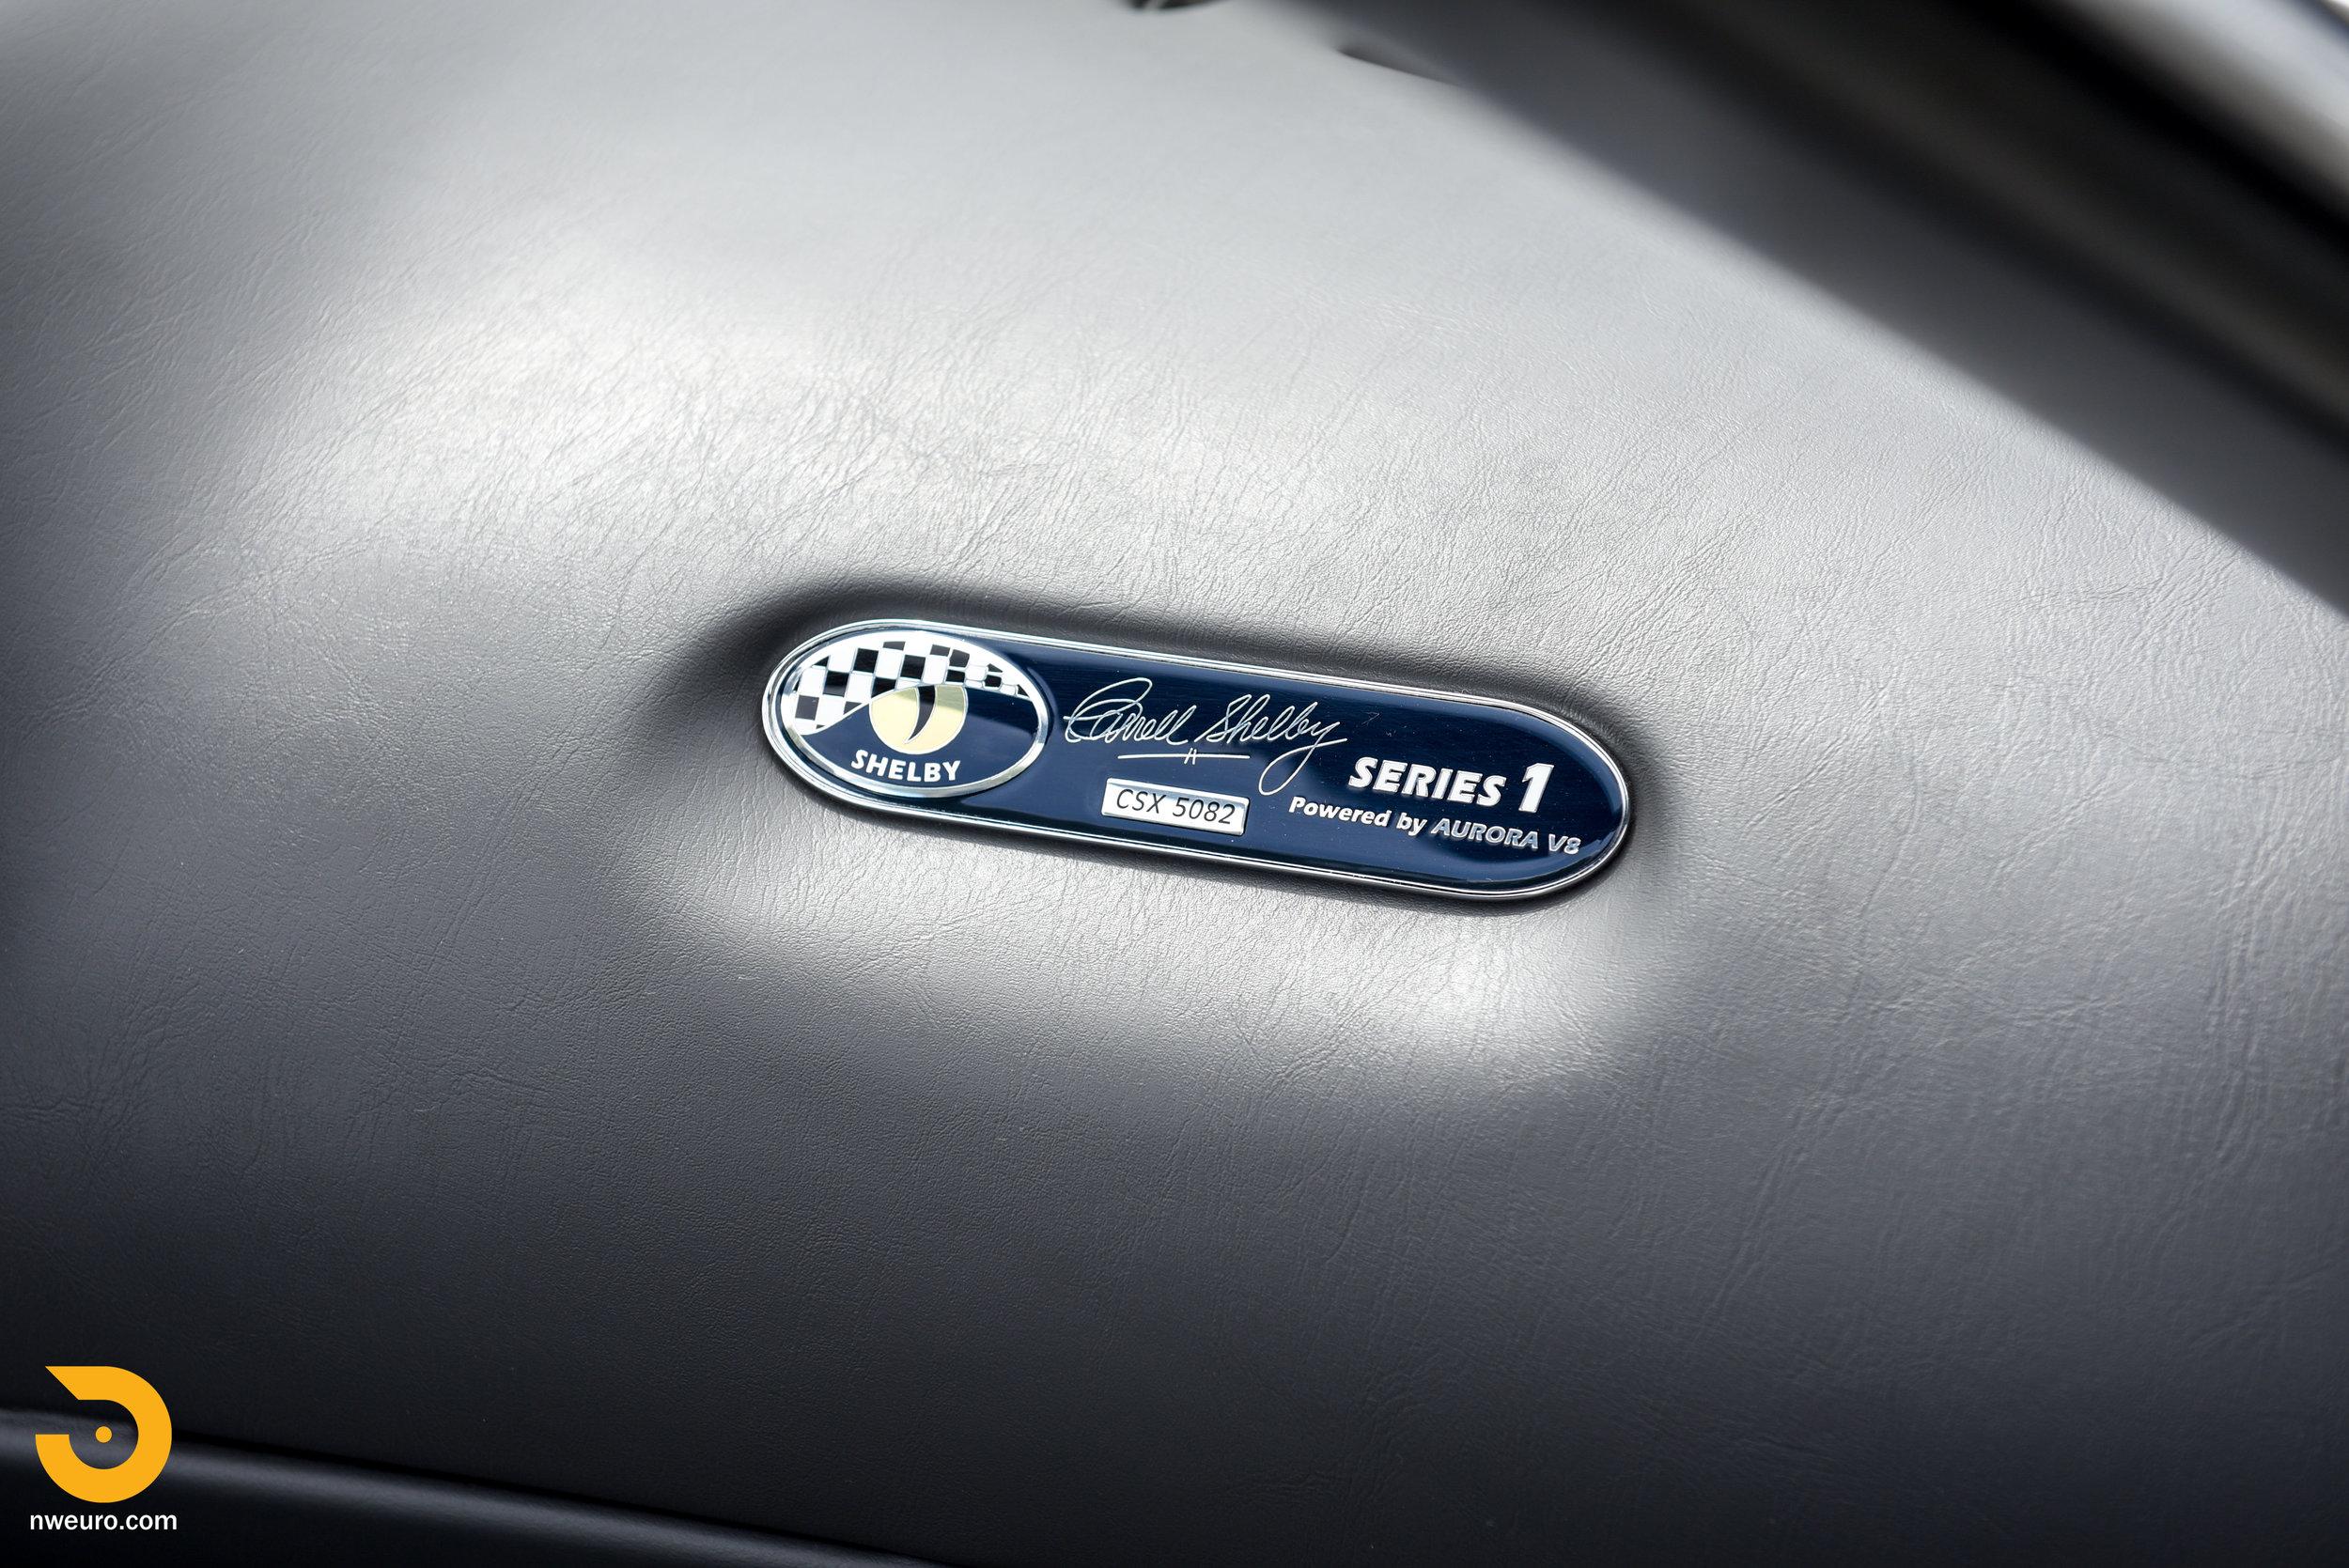 1999 Shelby Series 1-30.jpg